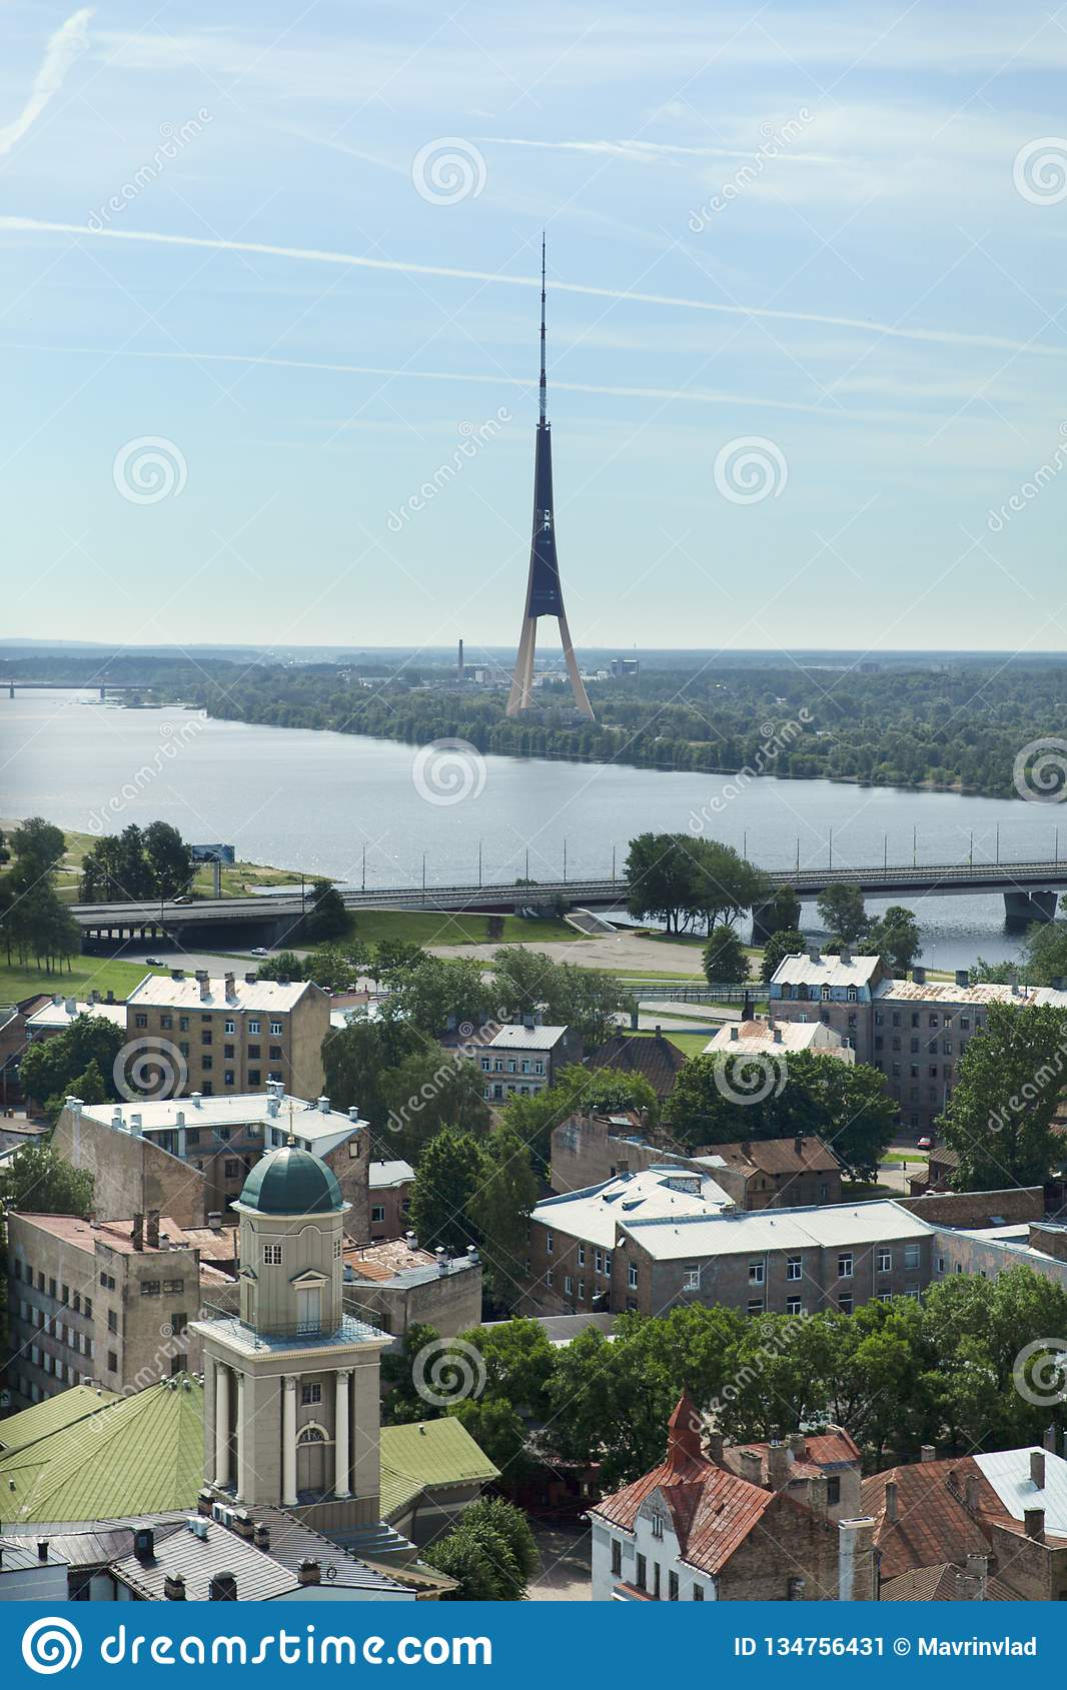 Riga communication tower